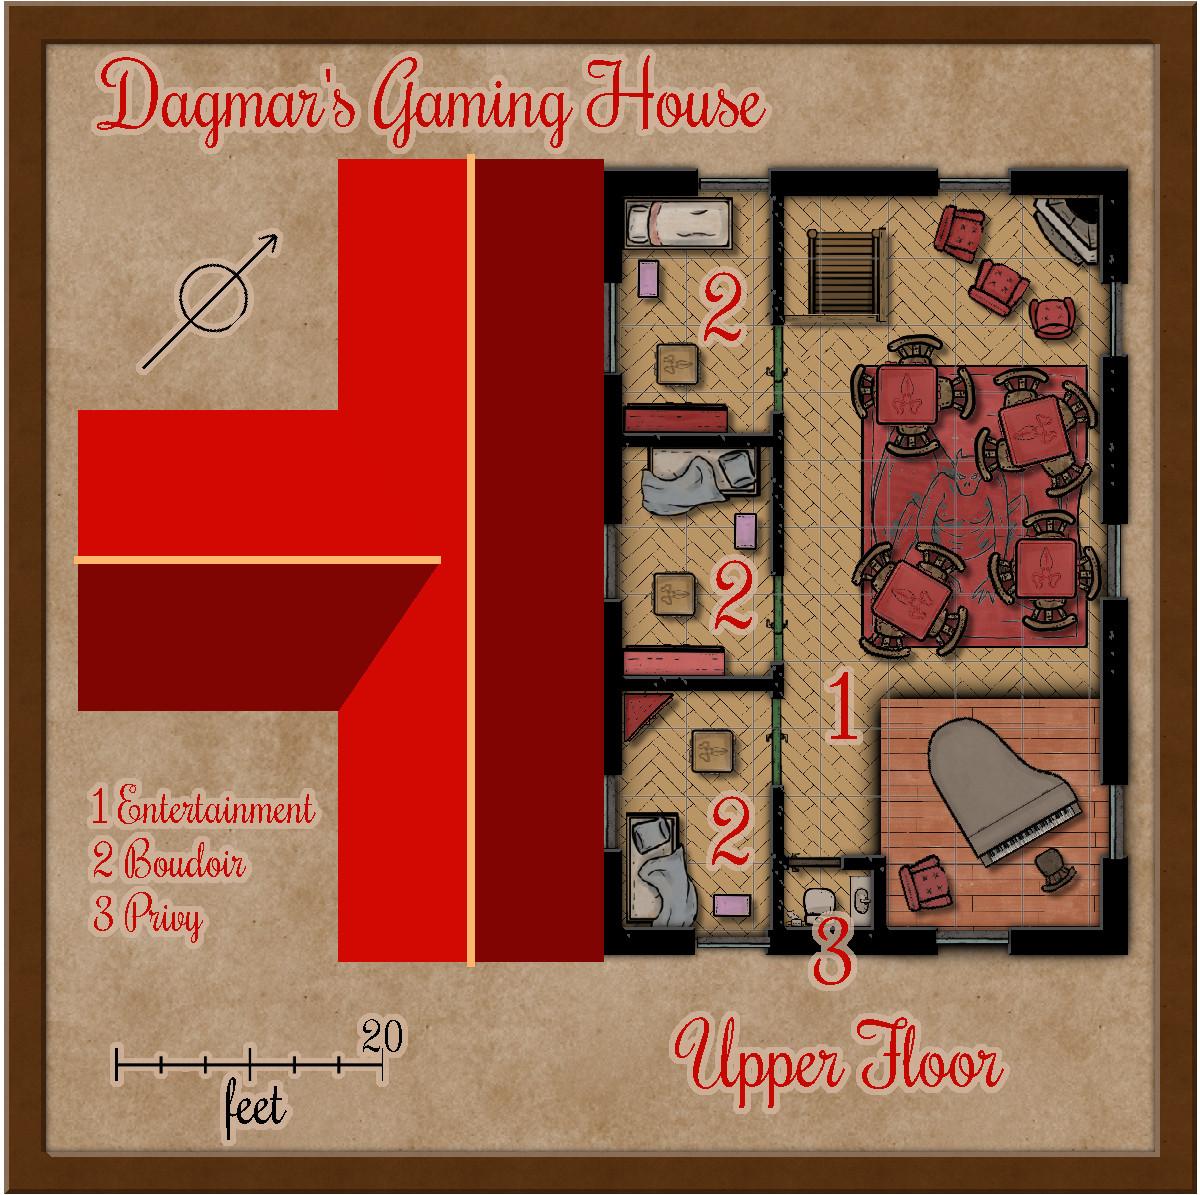 Dagmar's Gaming House_Floor 2.JPG